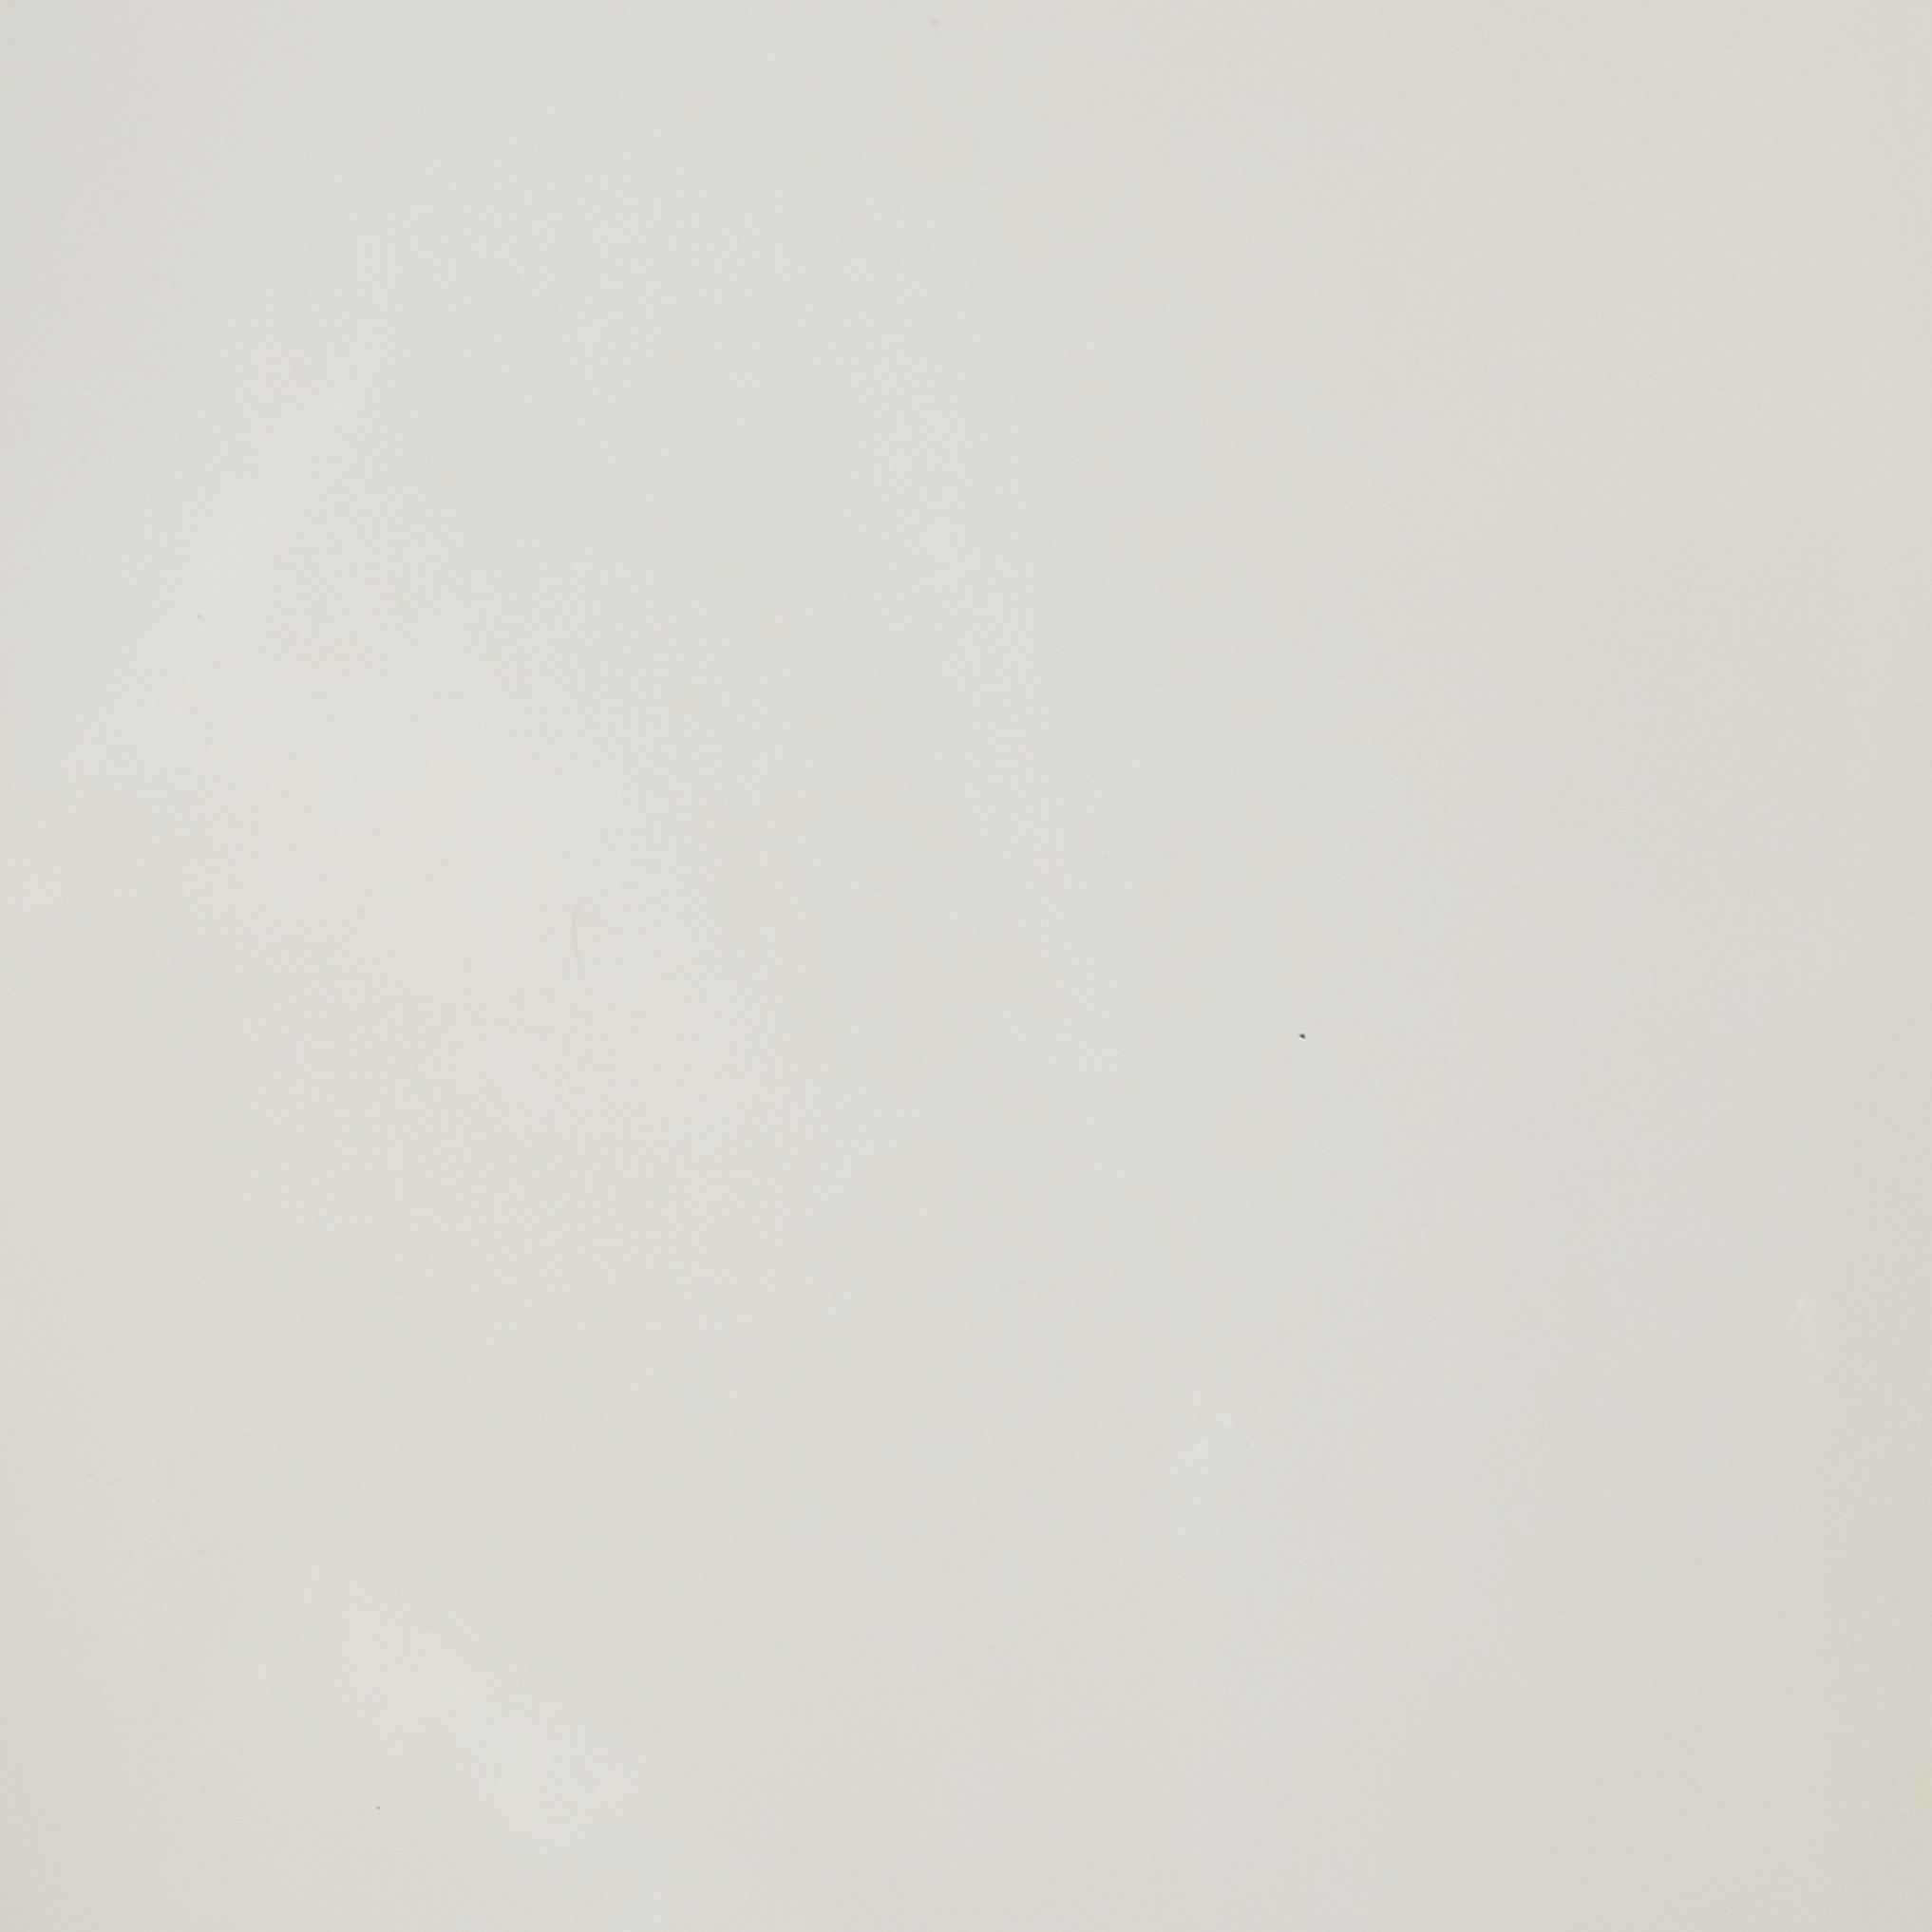 Film intérieur Shiny White Gloss